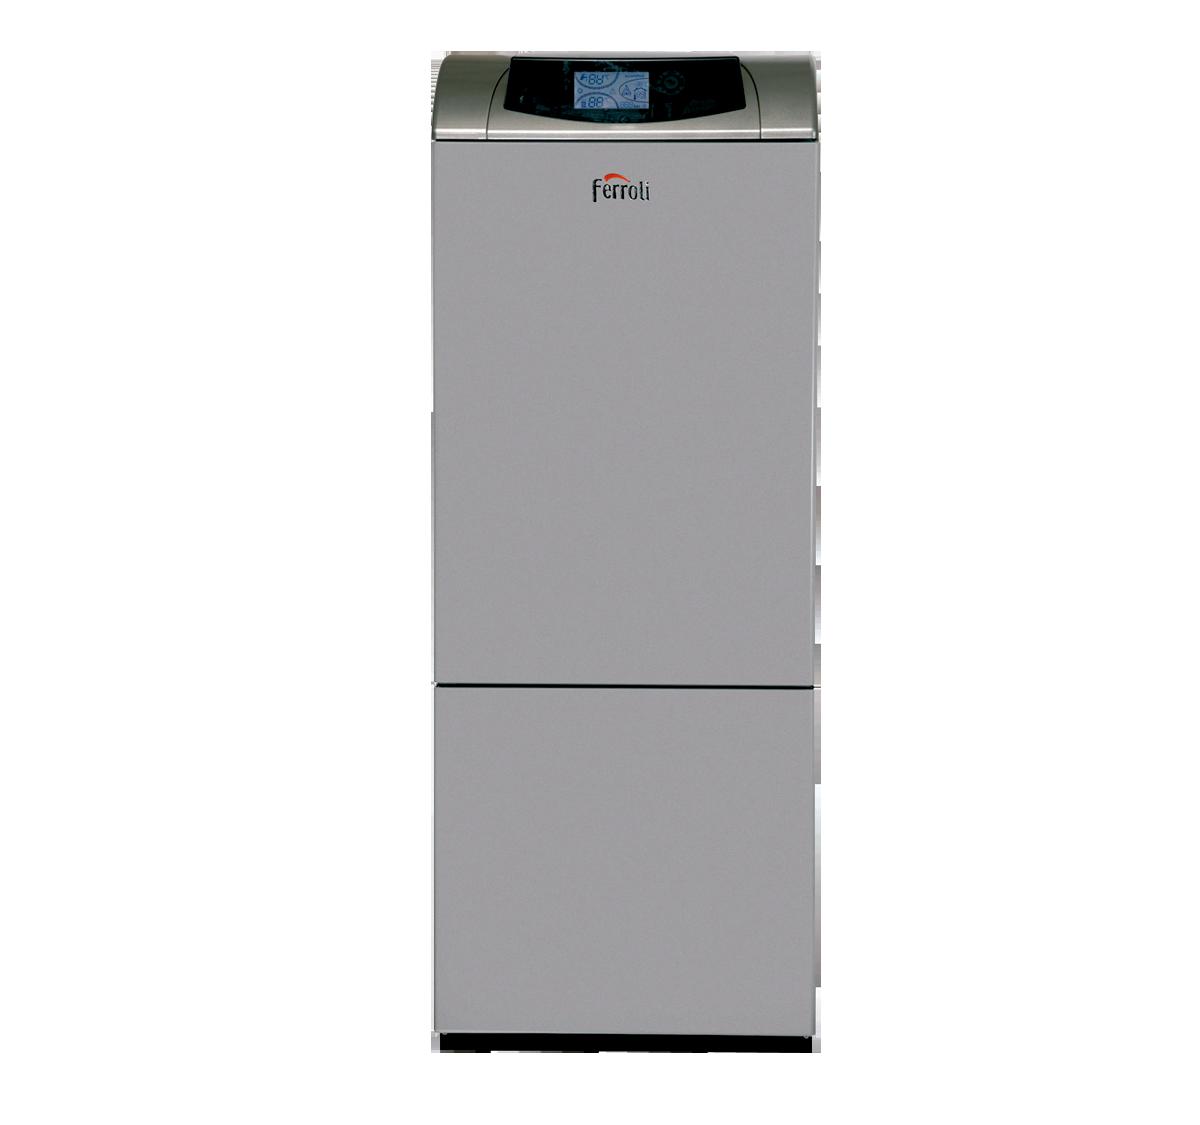 caldera de condensacion a gasoleo ferroli atlas d eco condens 34 k 130 unit caseragua venta calderas